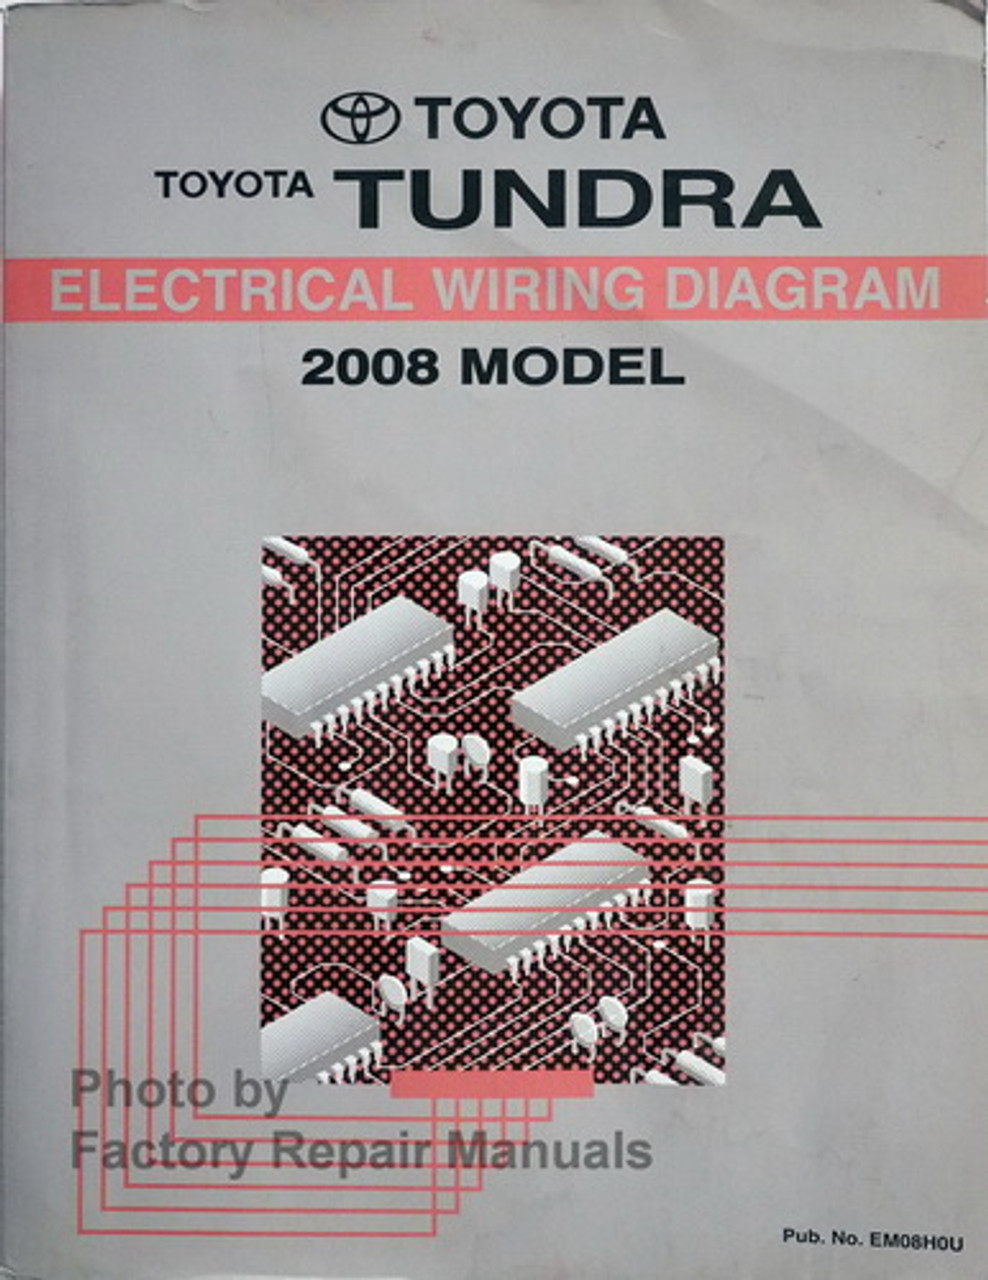 2008 Toyota Tundra Electrical Wiring Diagrams Original ...